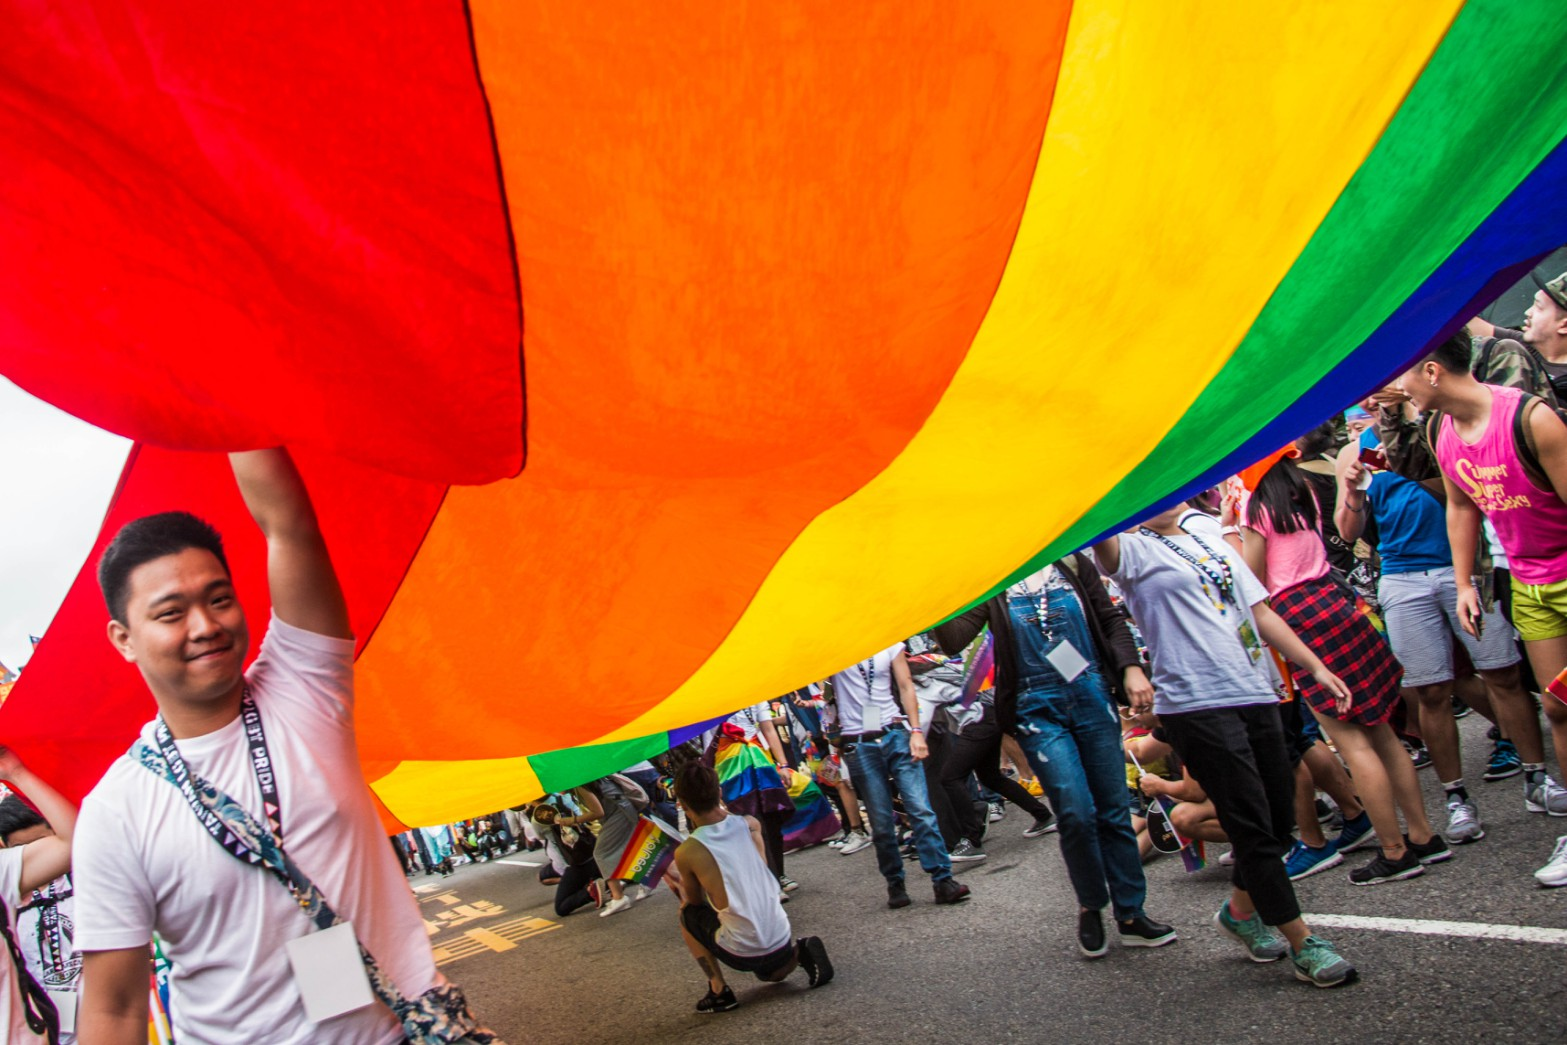 Taiwan 2016 LGBT Pride Parade began with a huge rainbow flag.Photo/Hsieh, Pei-yu(謝珮瑜)